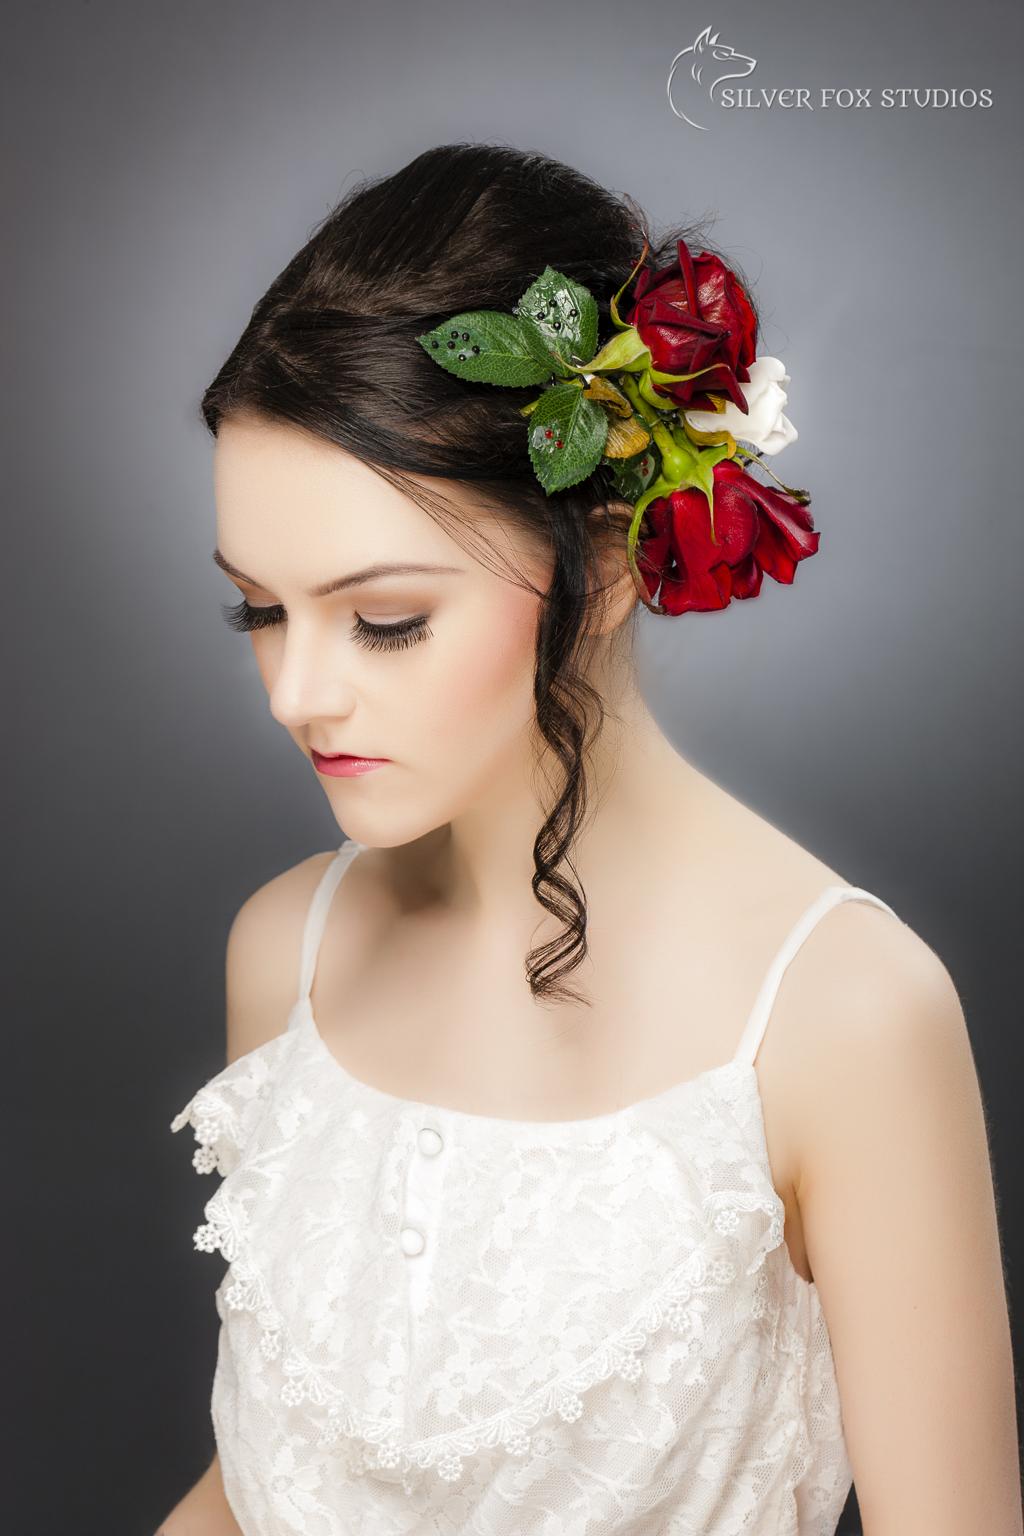 Portrait Shoot - Beauty & Makeup Photography | Silver Fox Studios